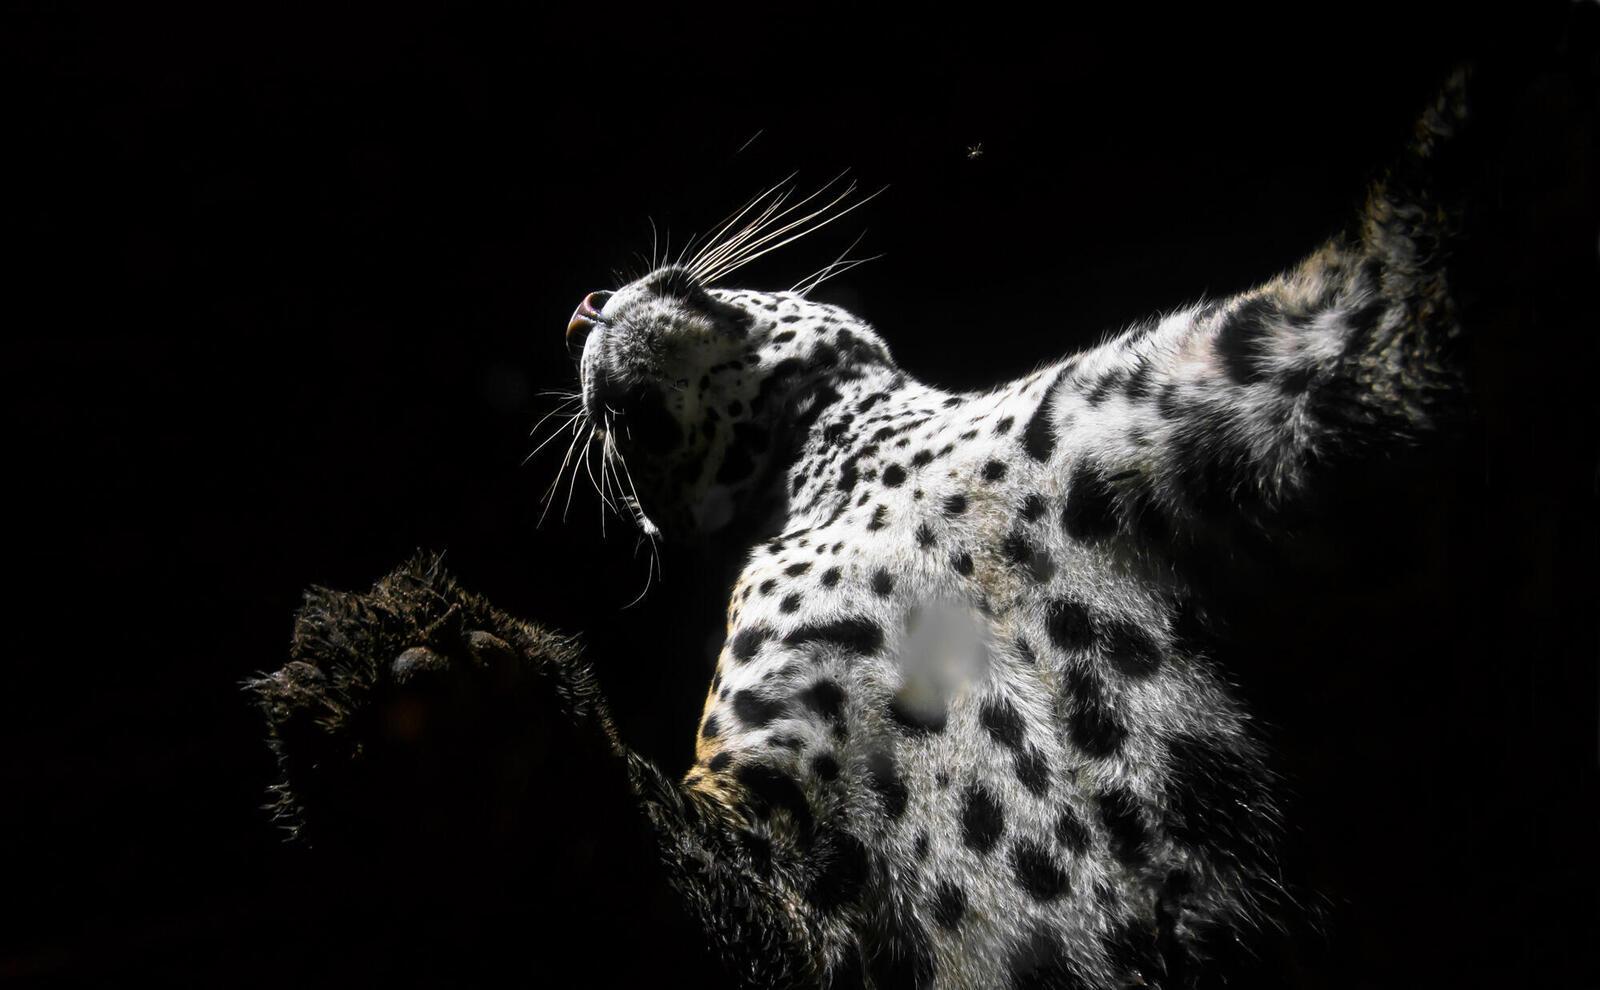 jaguar under fall2017